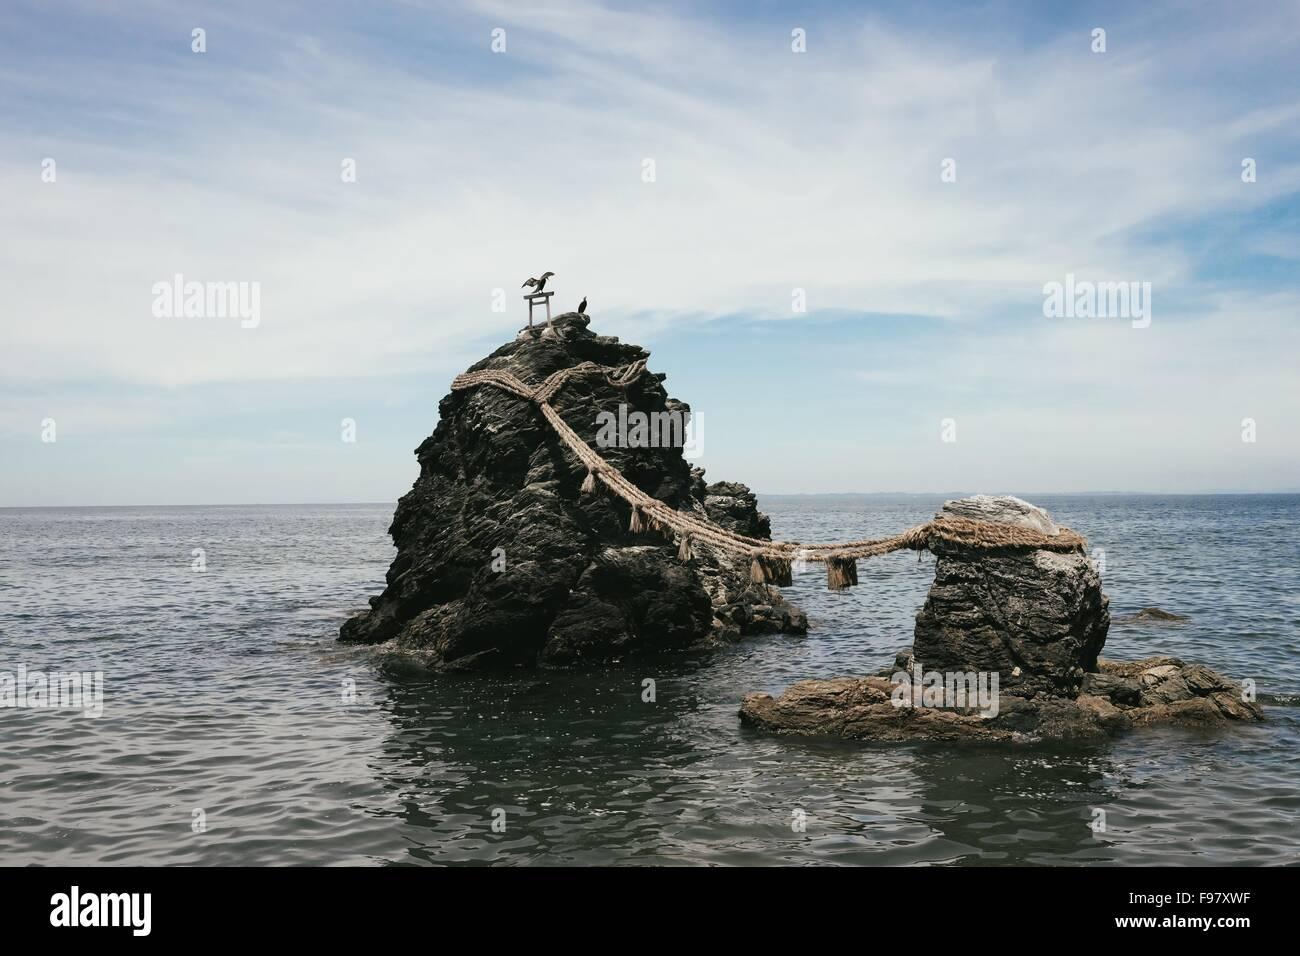 Meoto Iwa Against Cloudy Sky - Stock Image